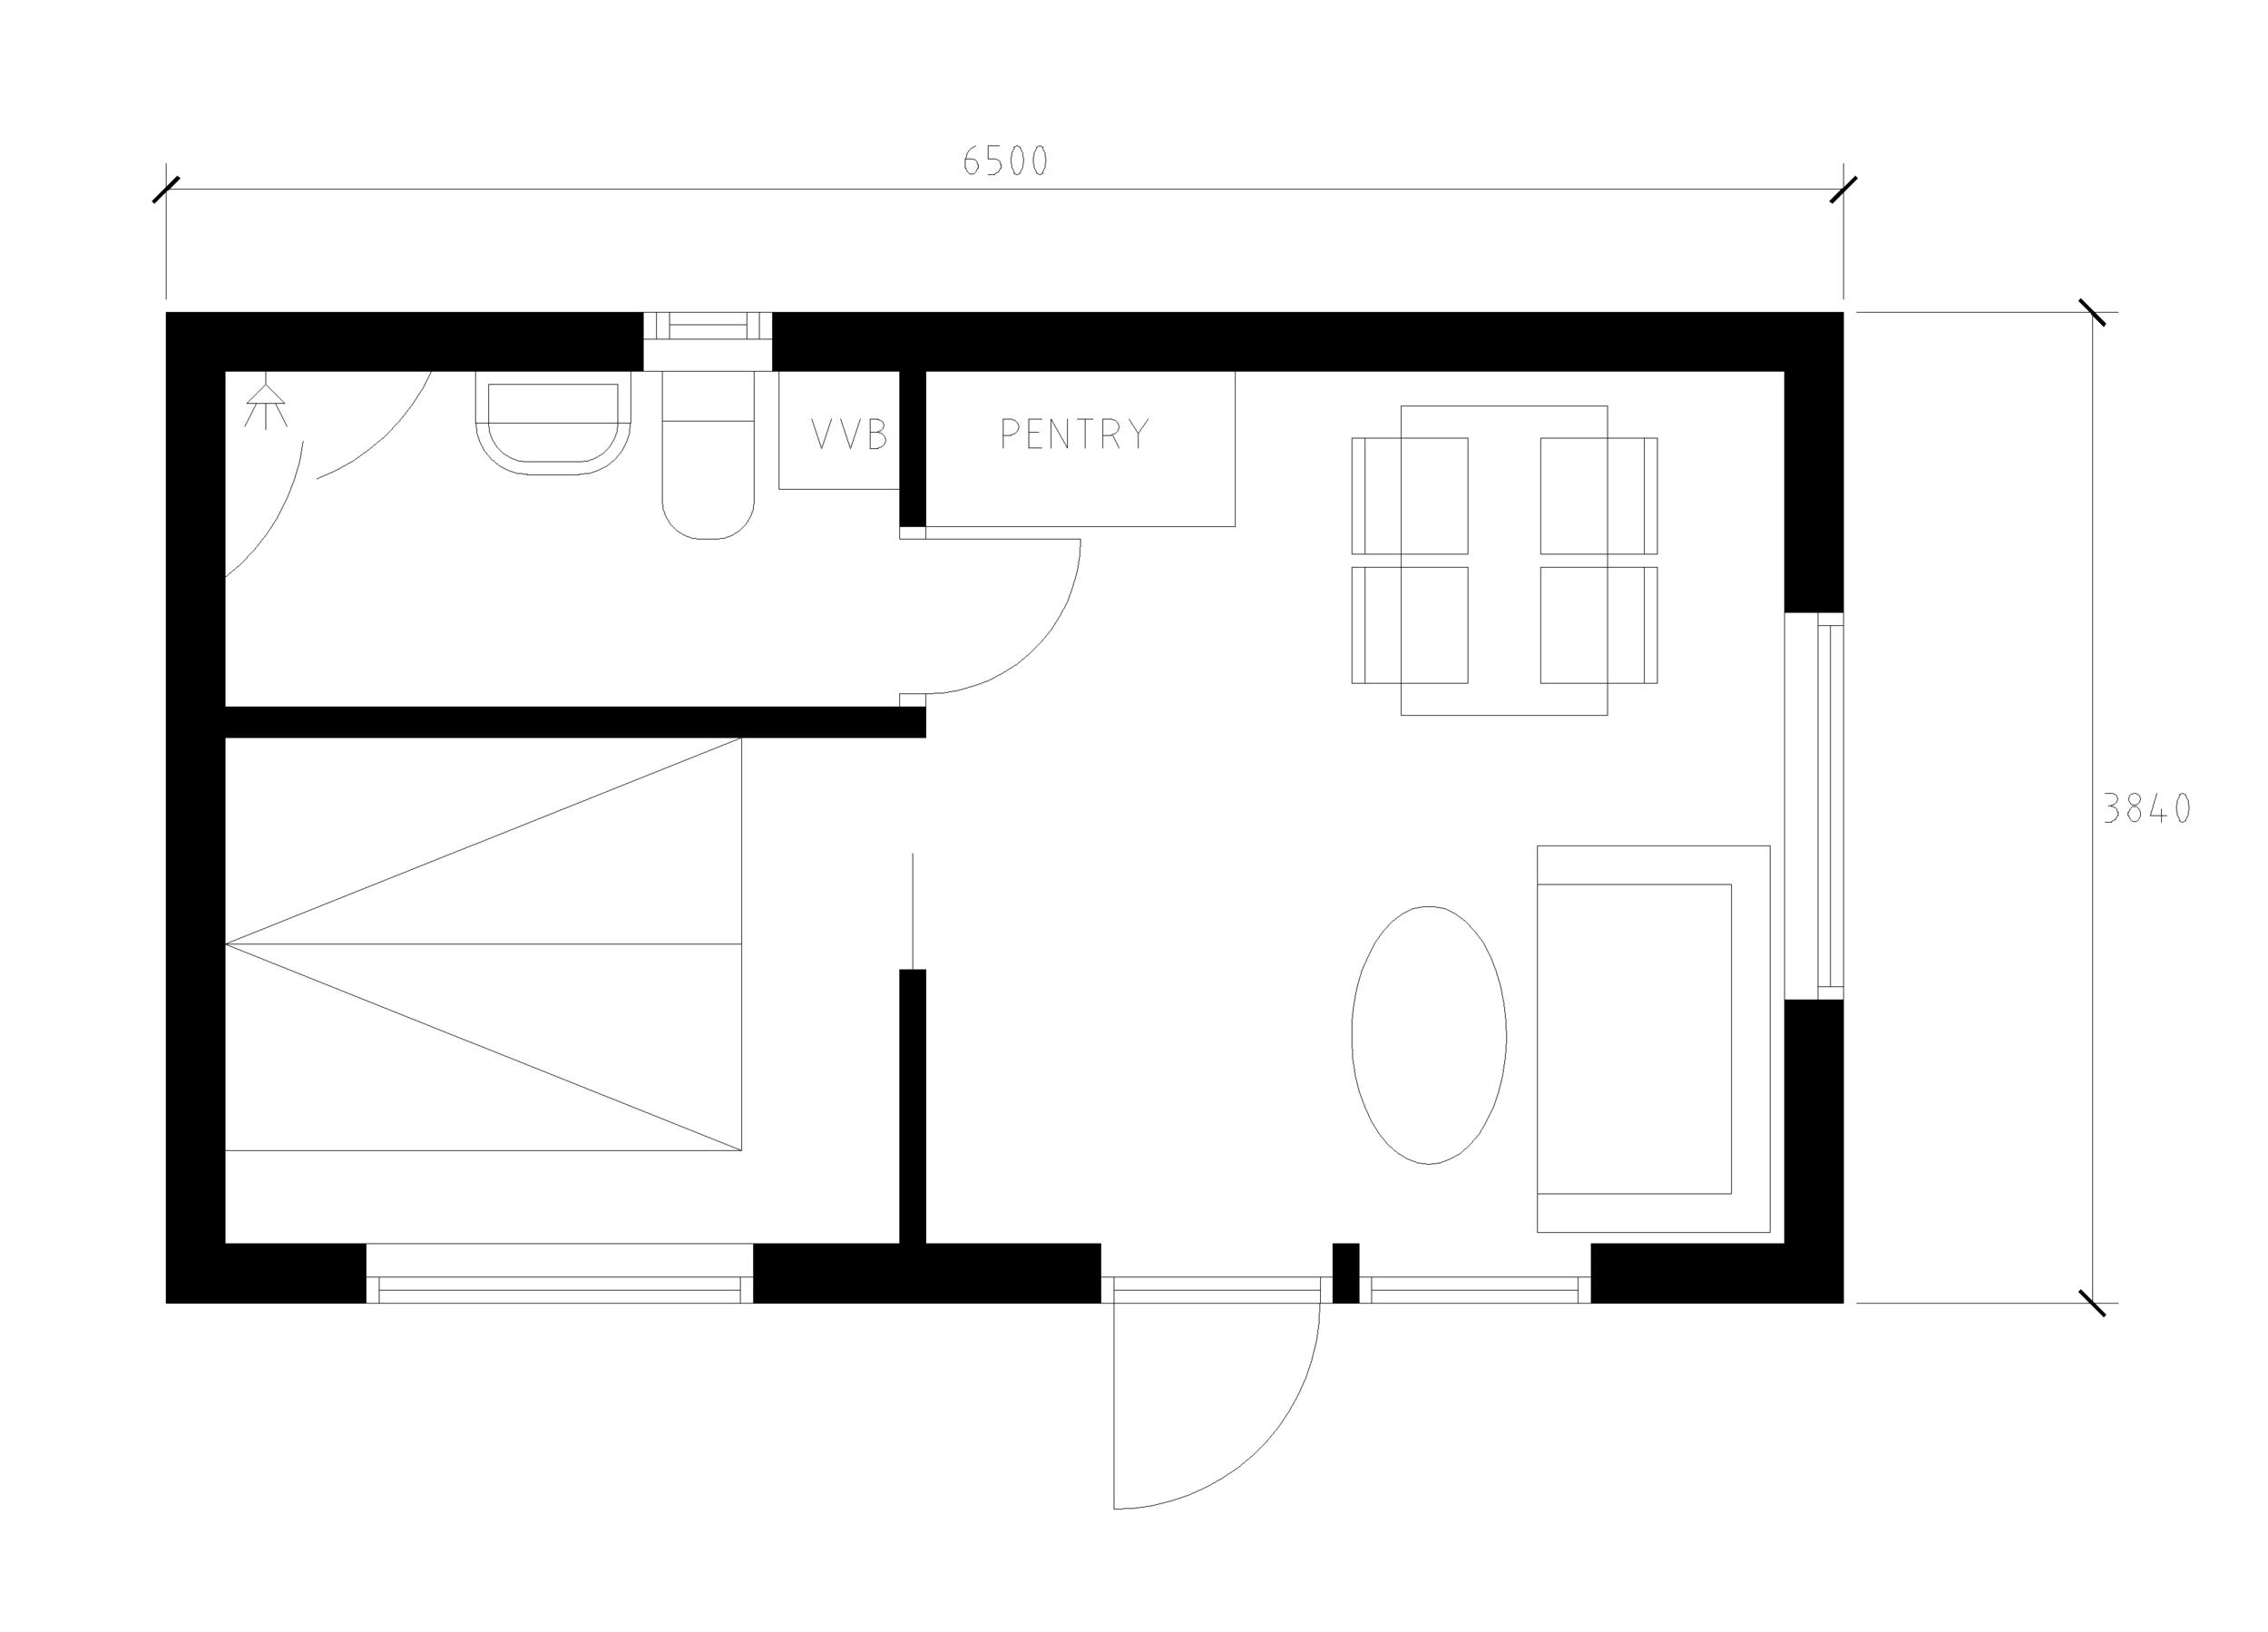 easy-house-attefallshus-åhus-25-sovrum-badrum-kök-allrum-planlösning-1